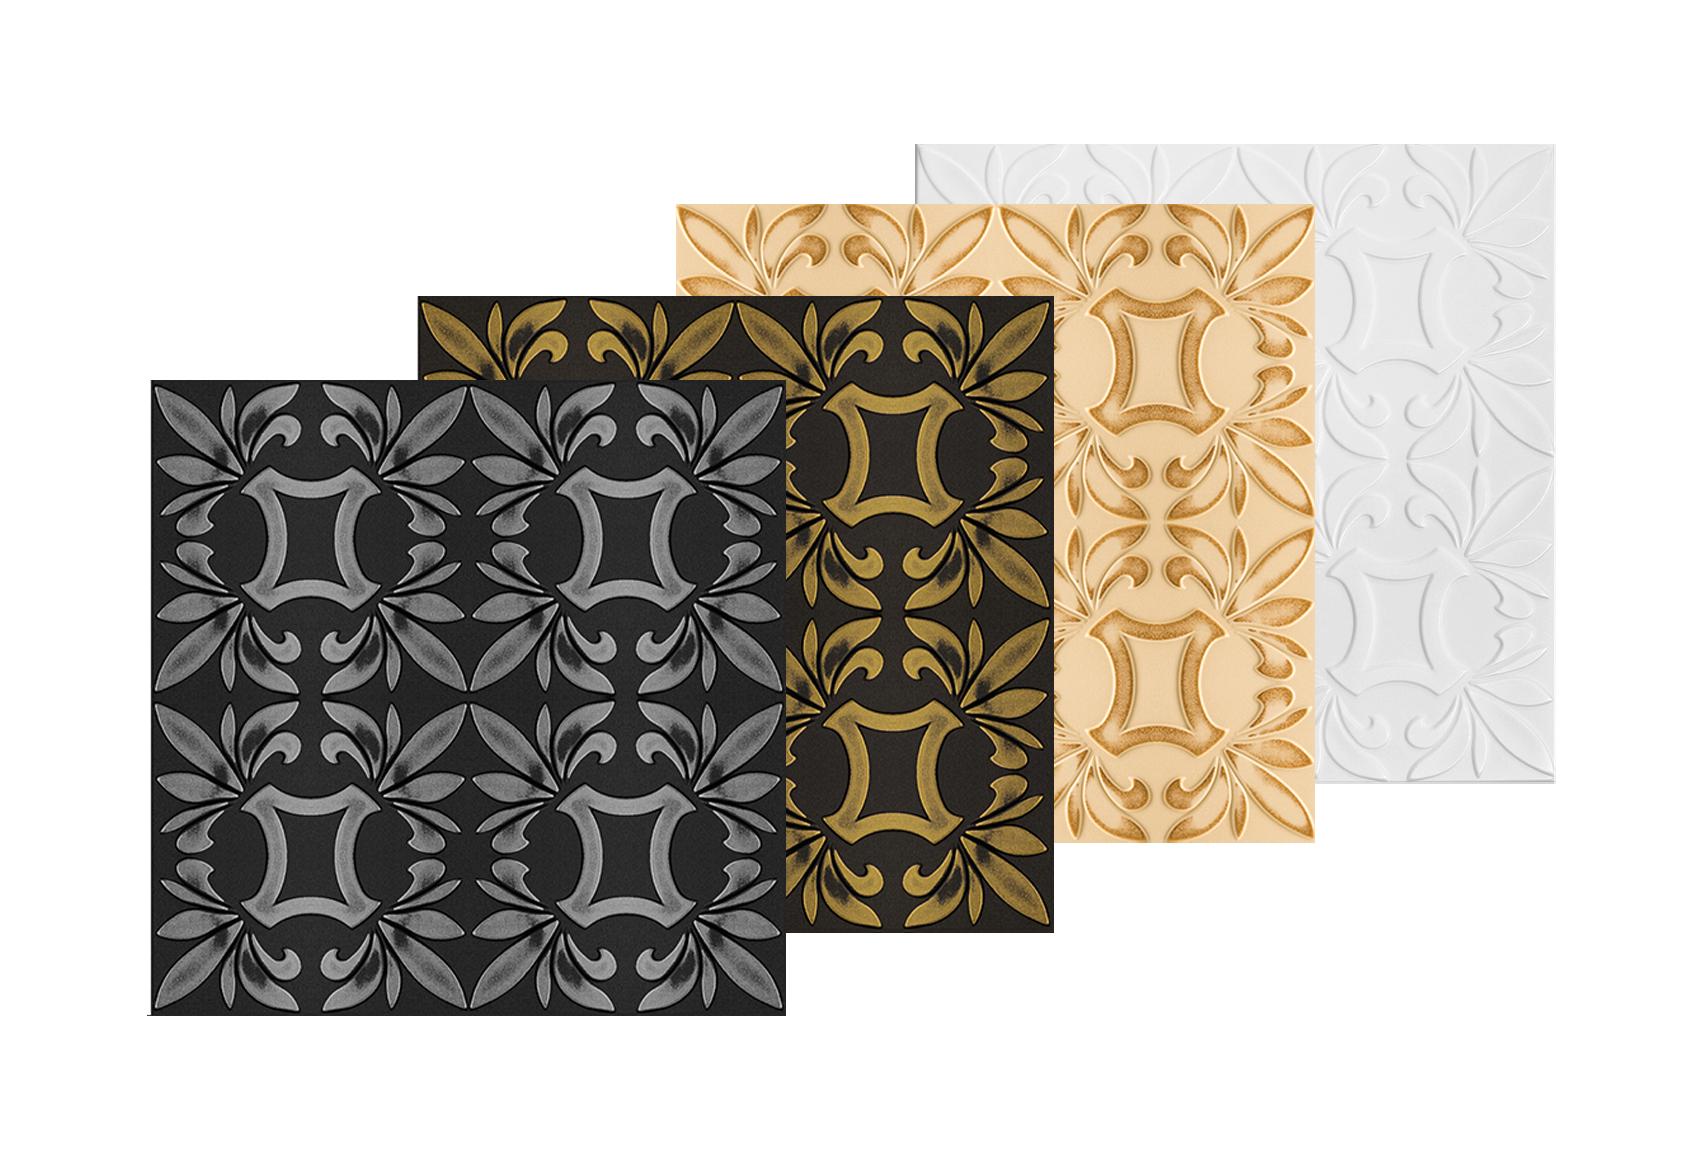 20 qm Deckenplatten Styroporplatten Stuck Decke Dekor Platten 50x50cm Nr.09